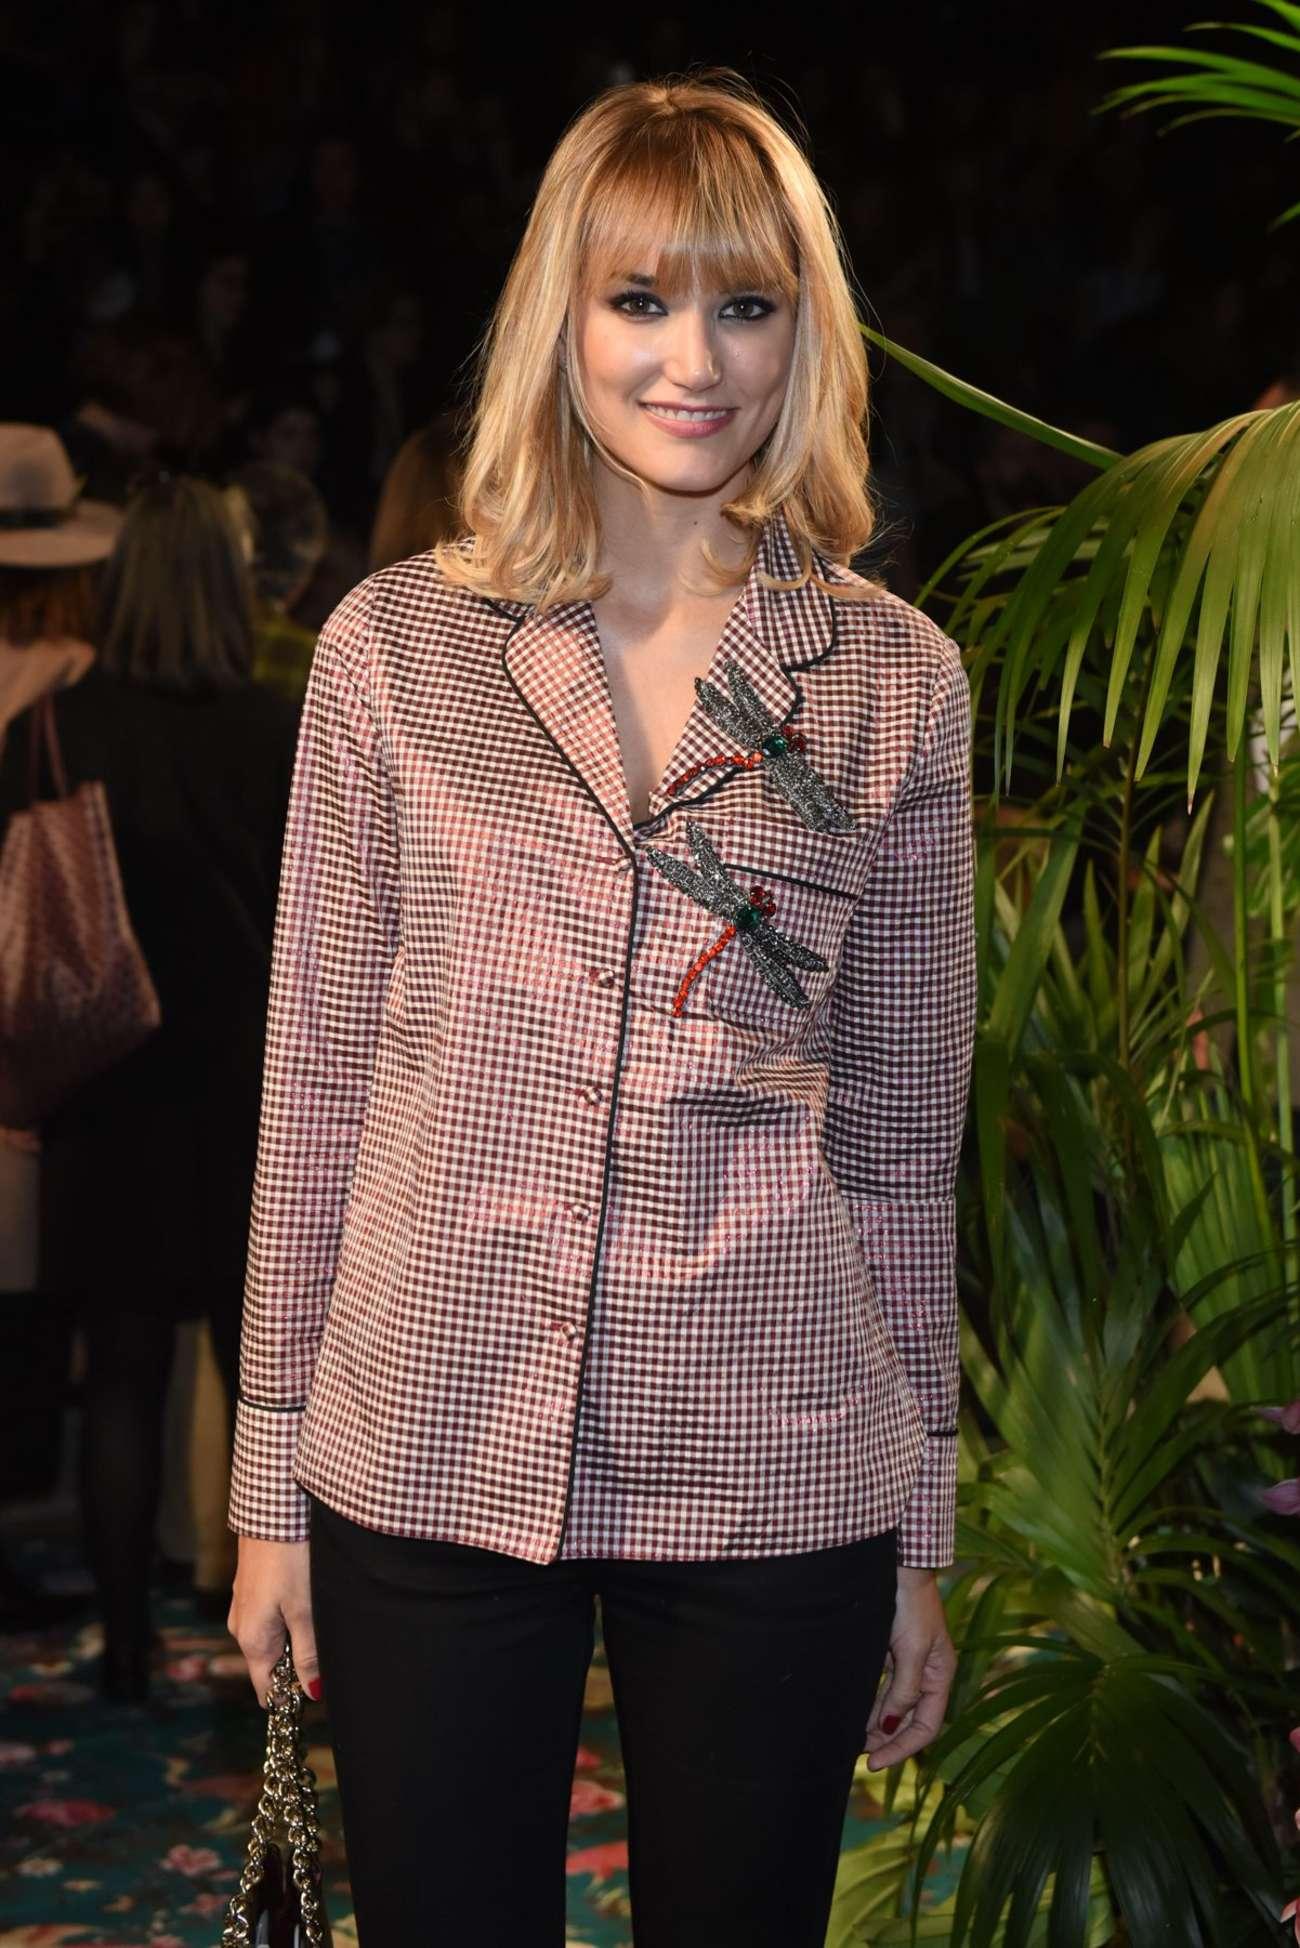 Alba carrillo mercedes benz fashion week 2016 in madrid for Mercedes benz fashion week